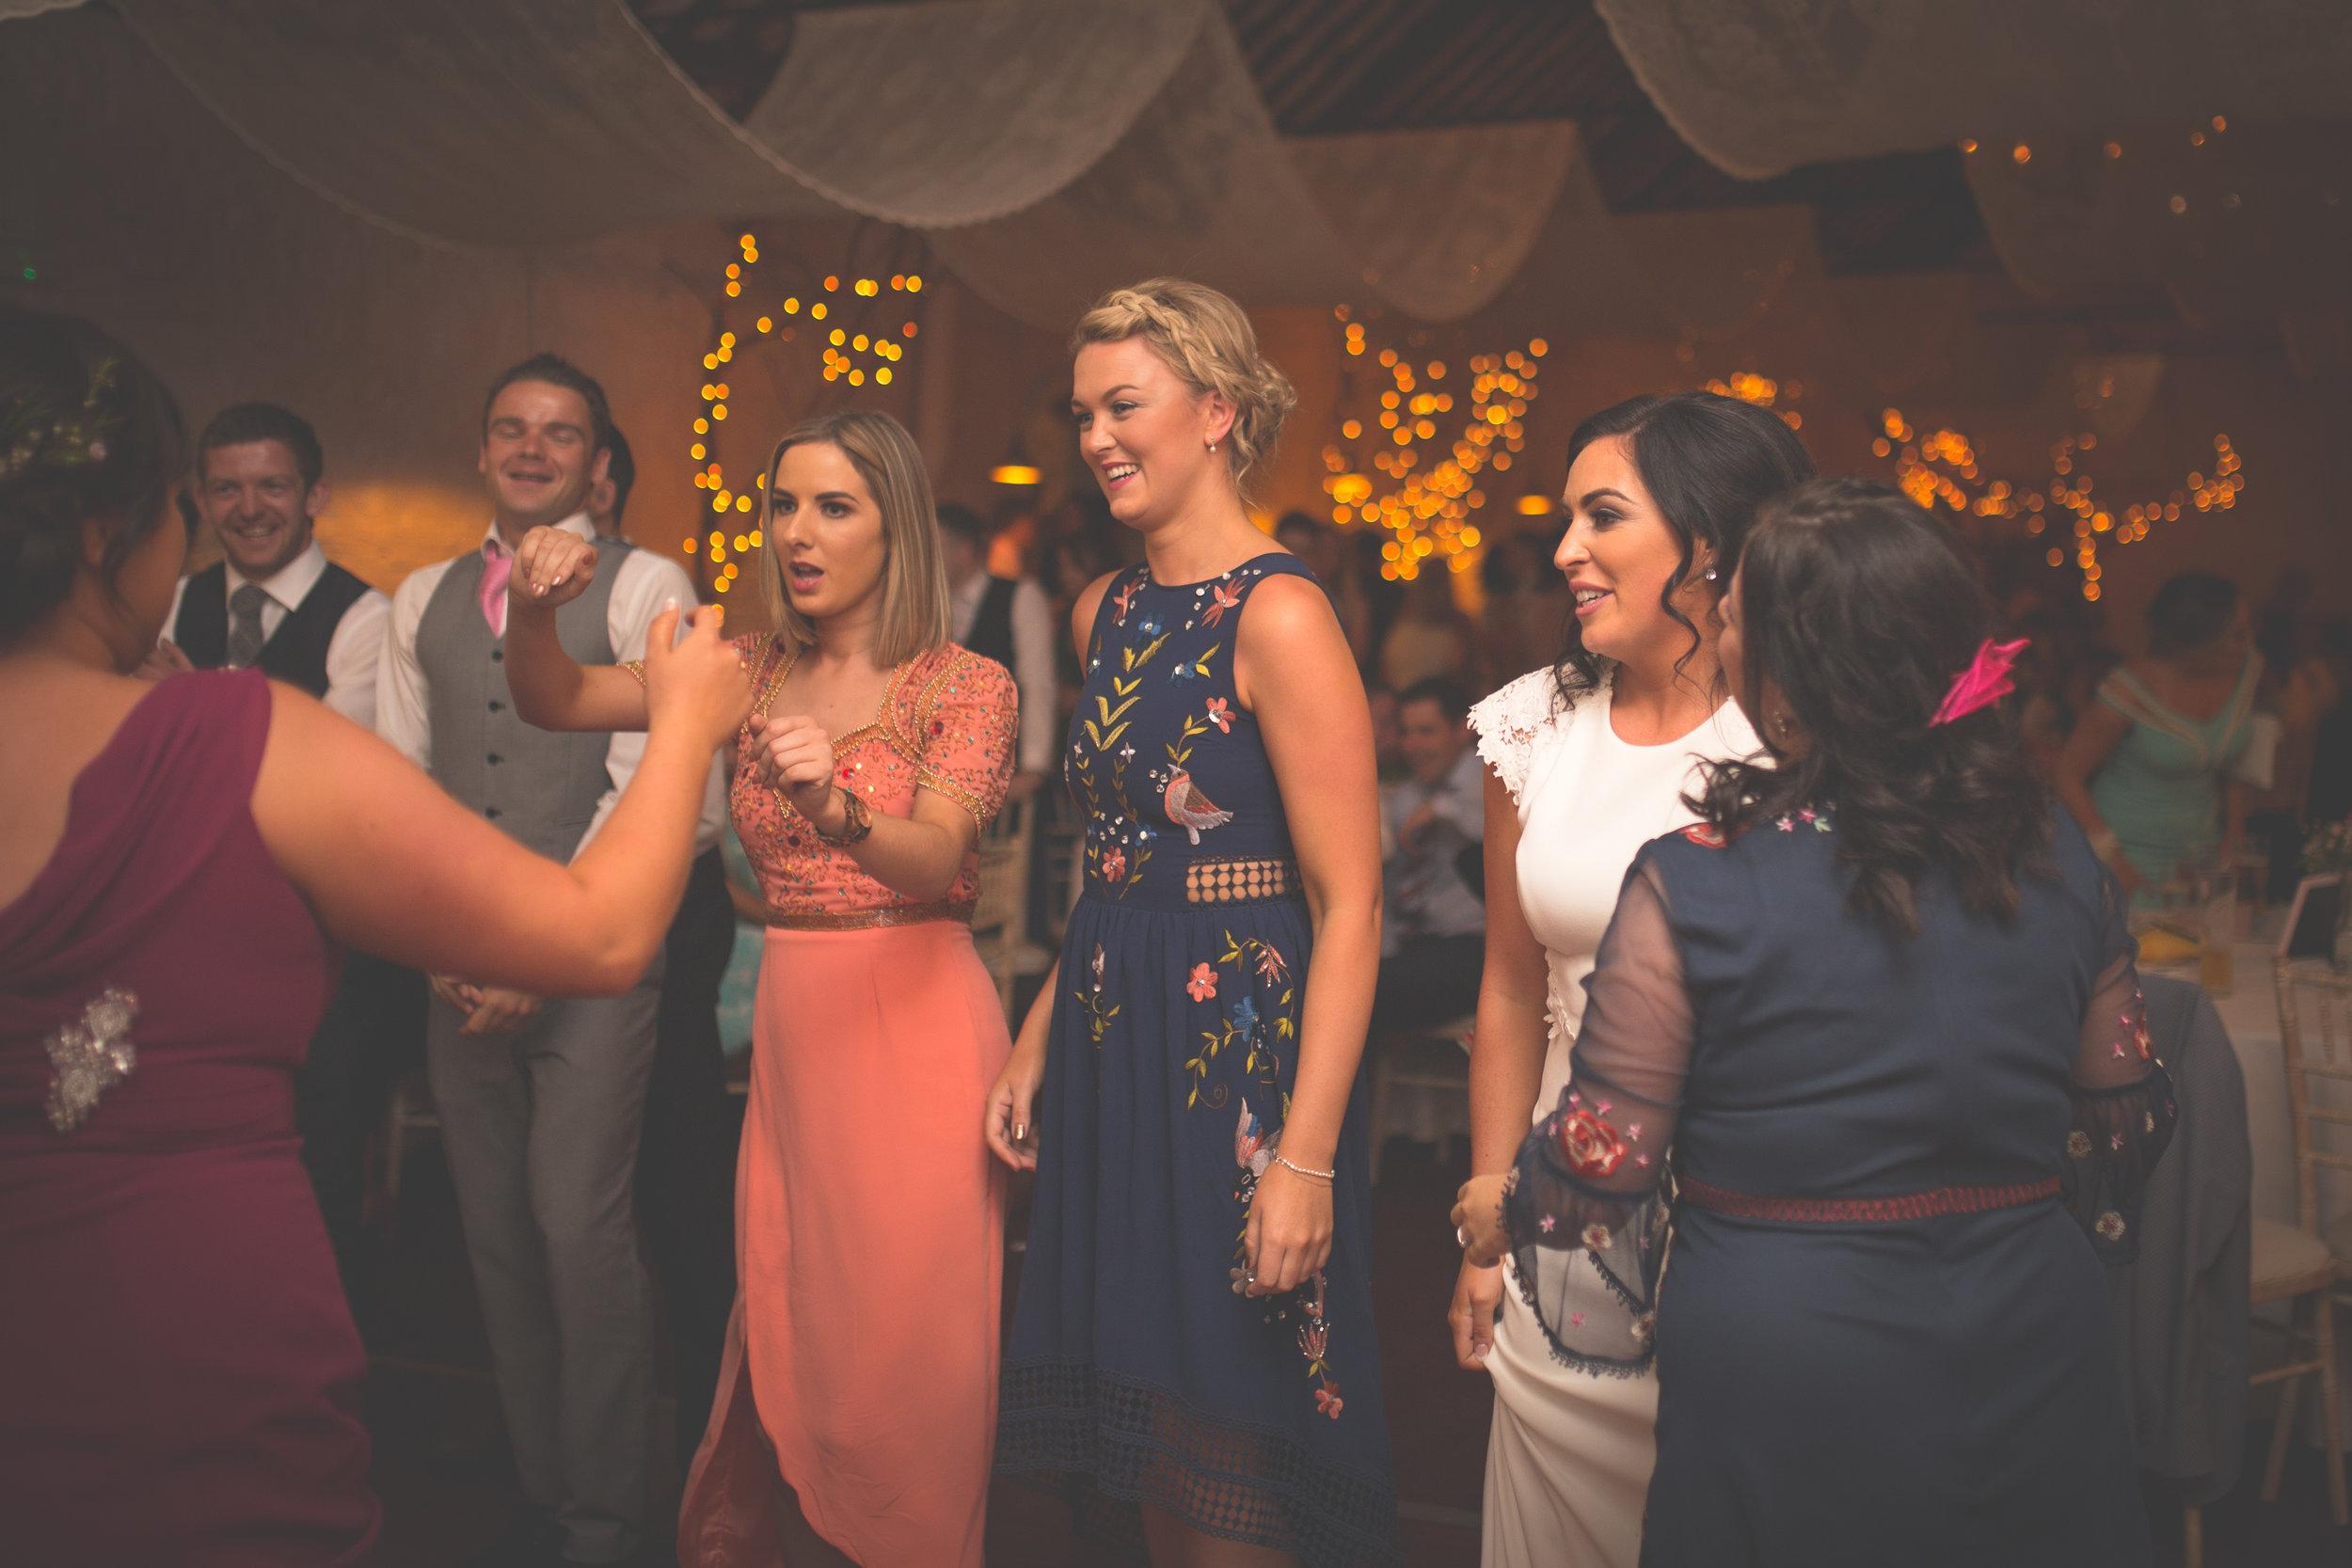 Brian McEwan Wedding Photography | Carol-Annee & Sean | The Dancing-65.jpg